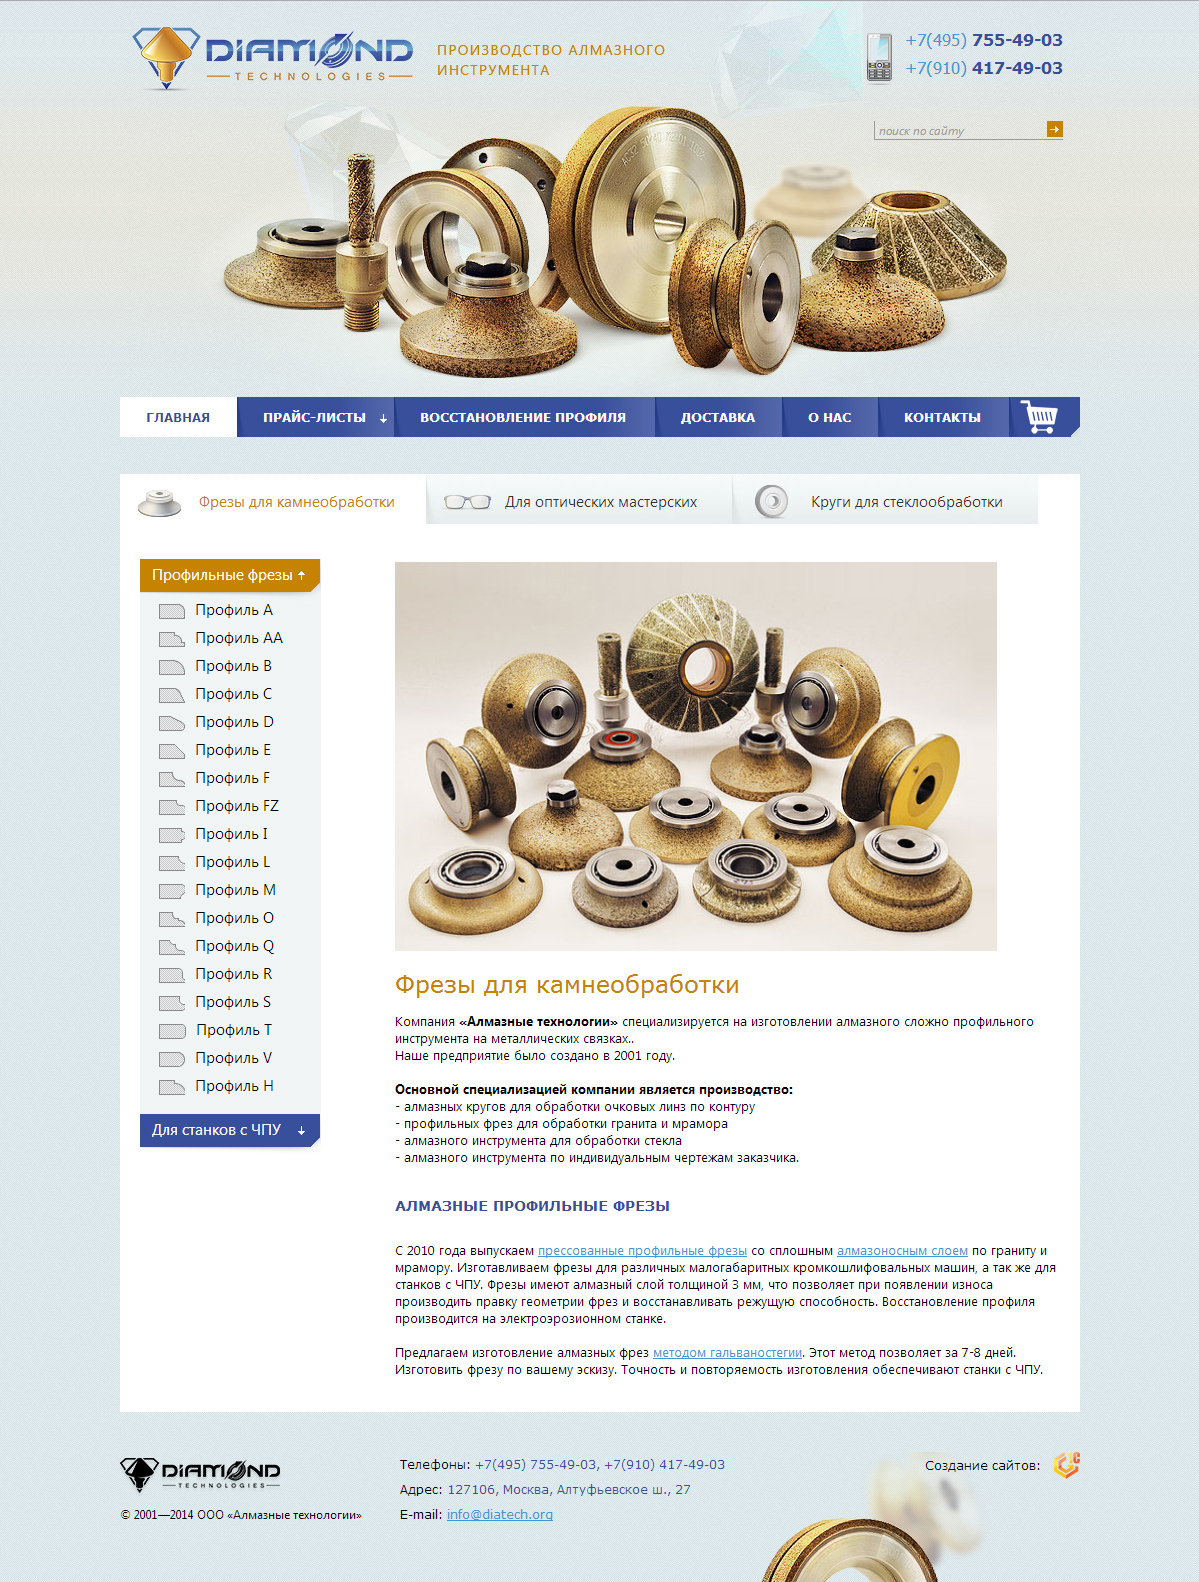 Интернет-магазин алмазного инструмента «Diamond»